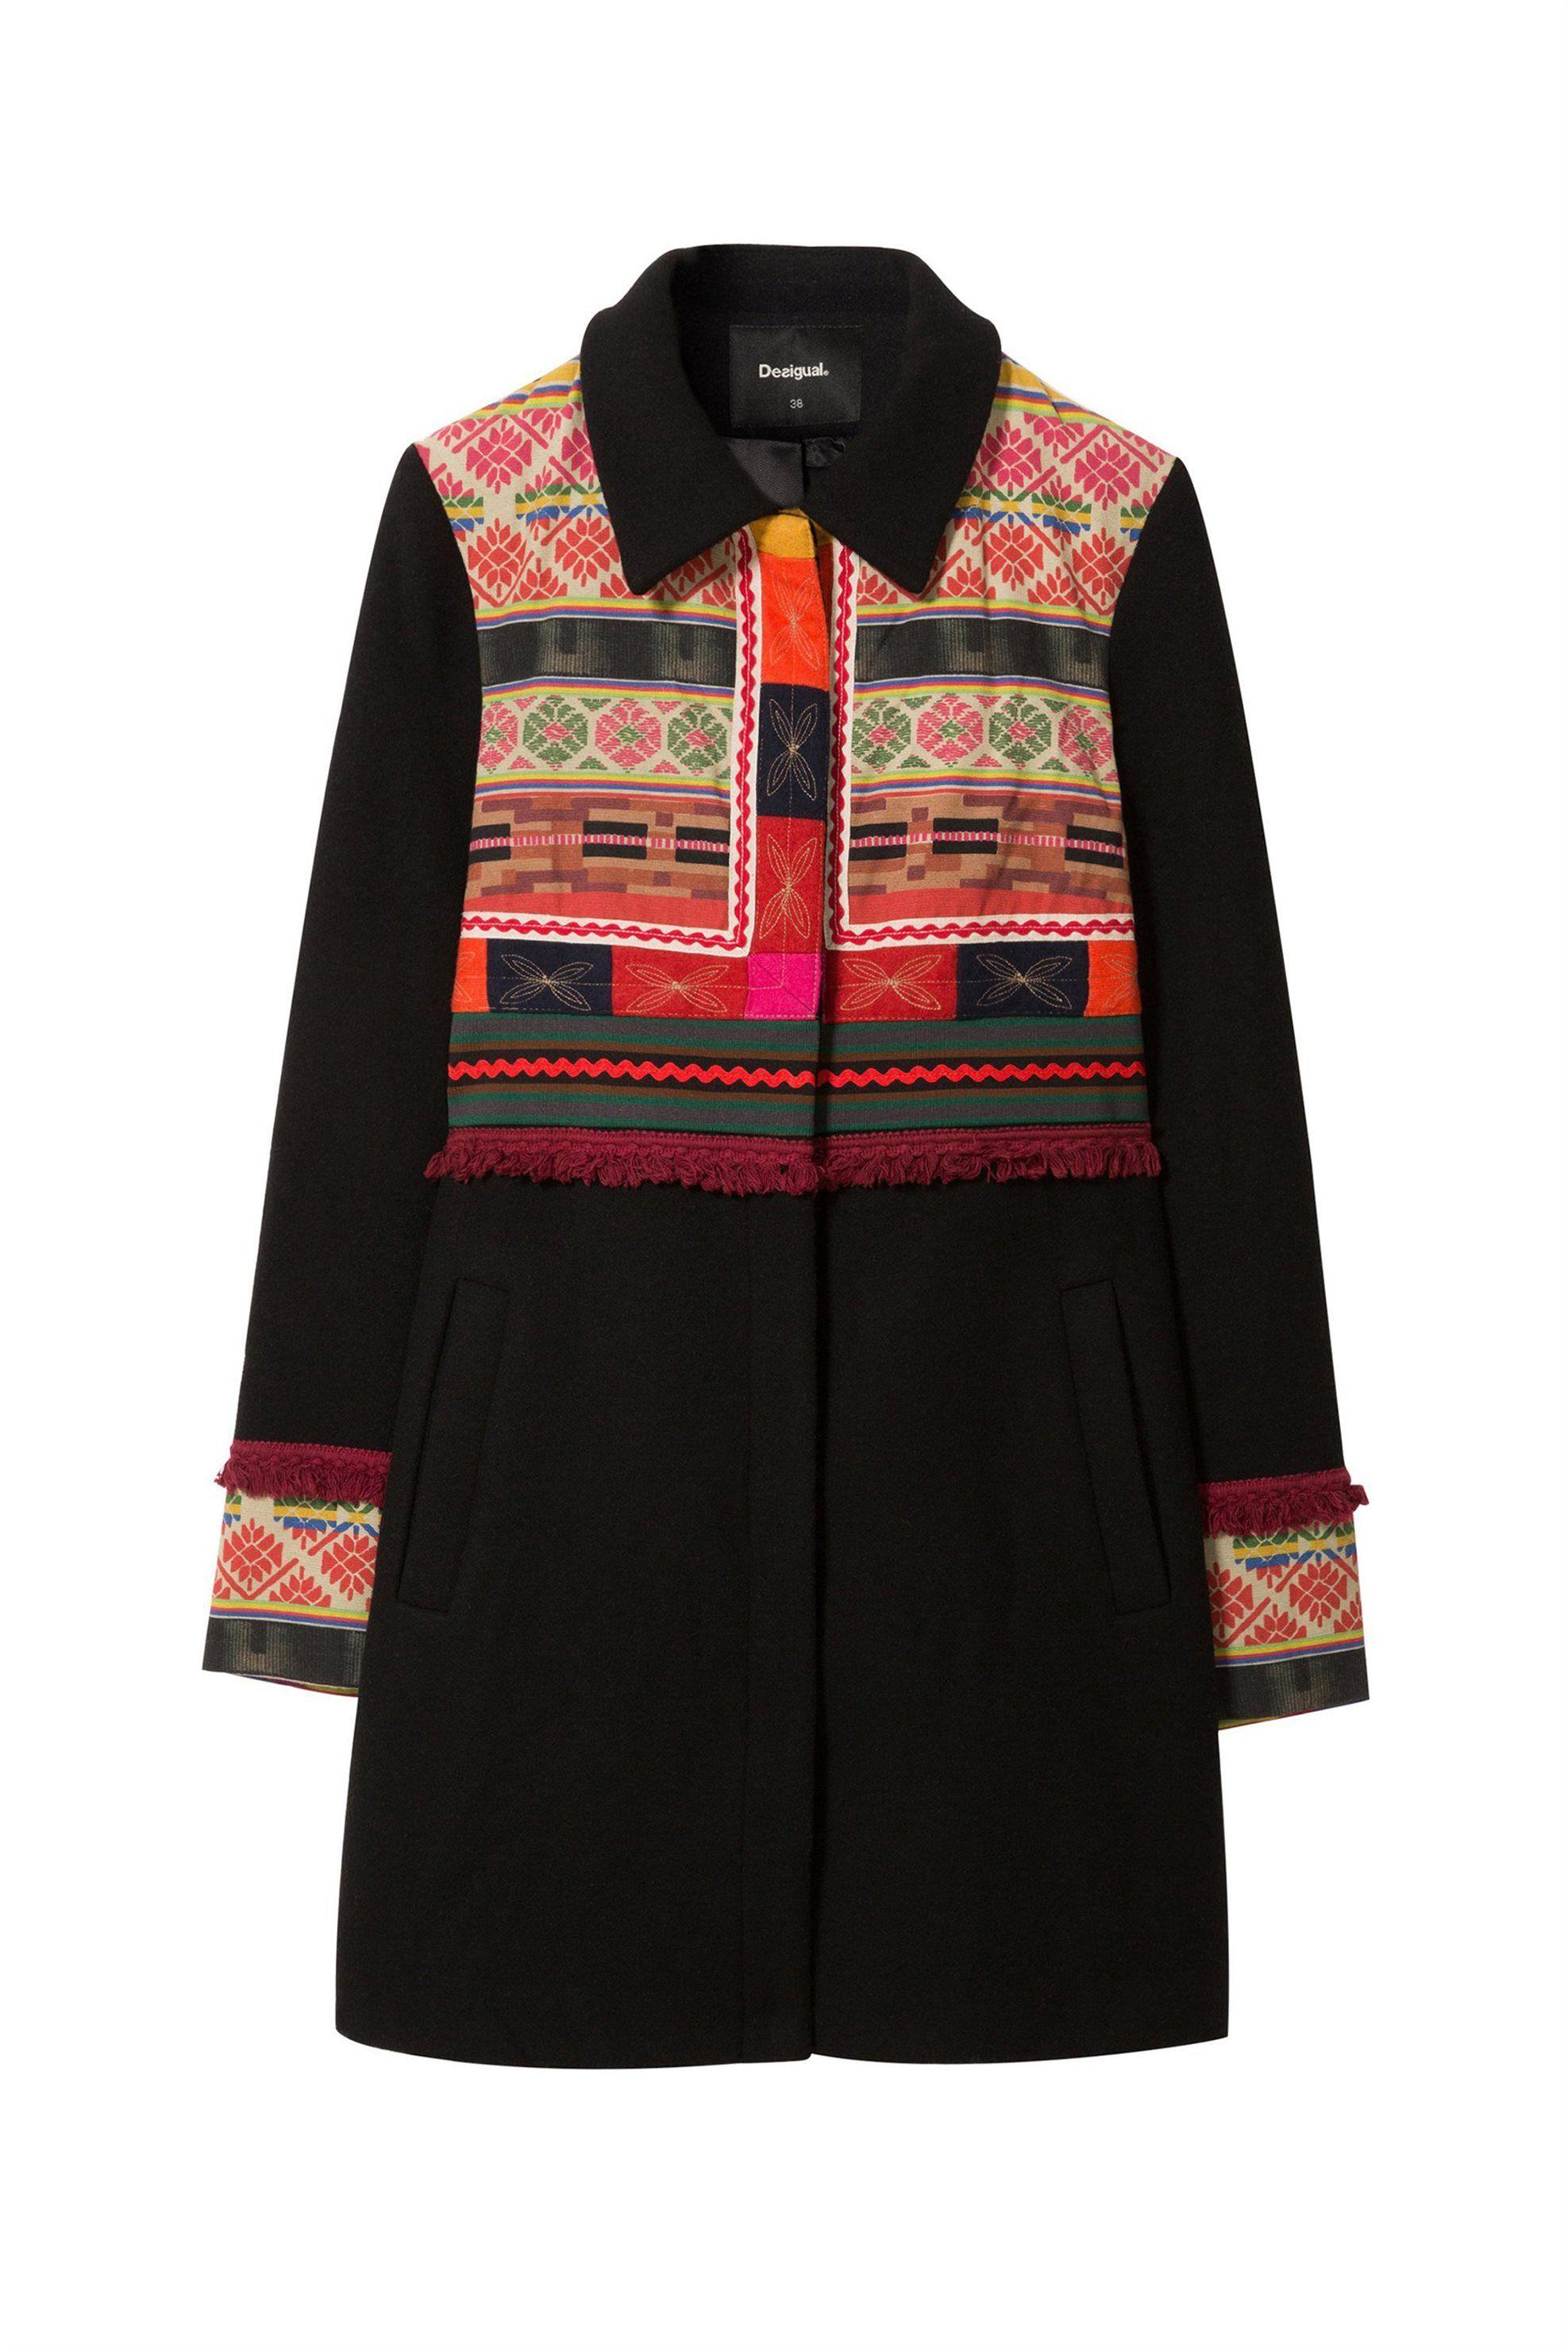 Desigual γυναικείο παλτό Mikele – 18WWEWAR – Μαύρο  55207b4d576